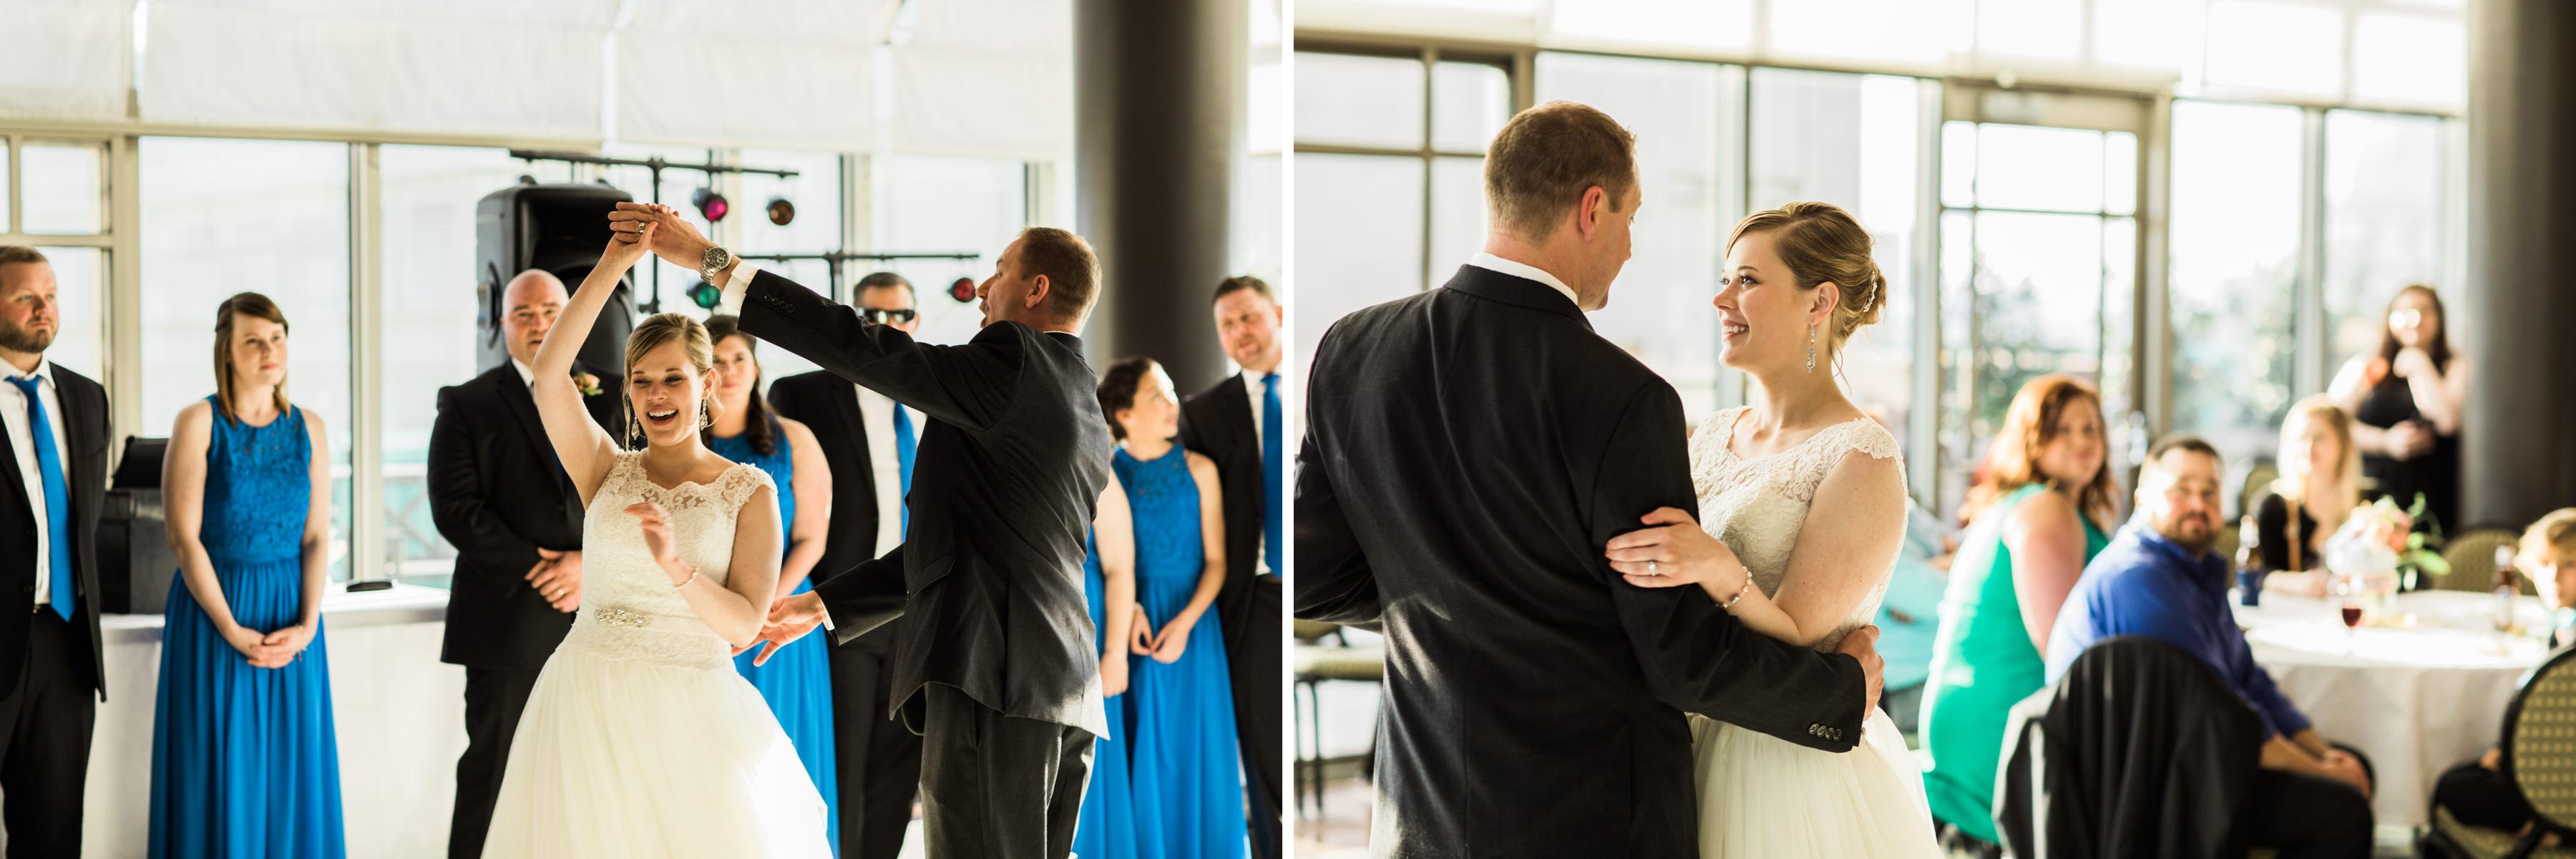 MAULDIN_WEDDING_MONTGOMERY_ALABAMA_WEDDING_PHOTOGRAPHY_99